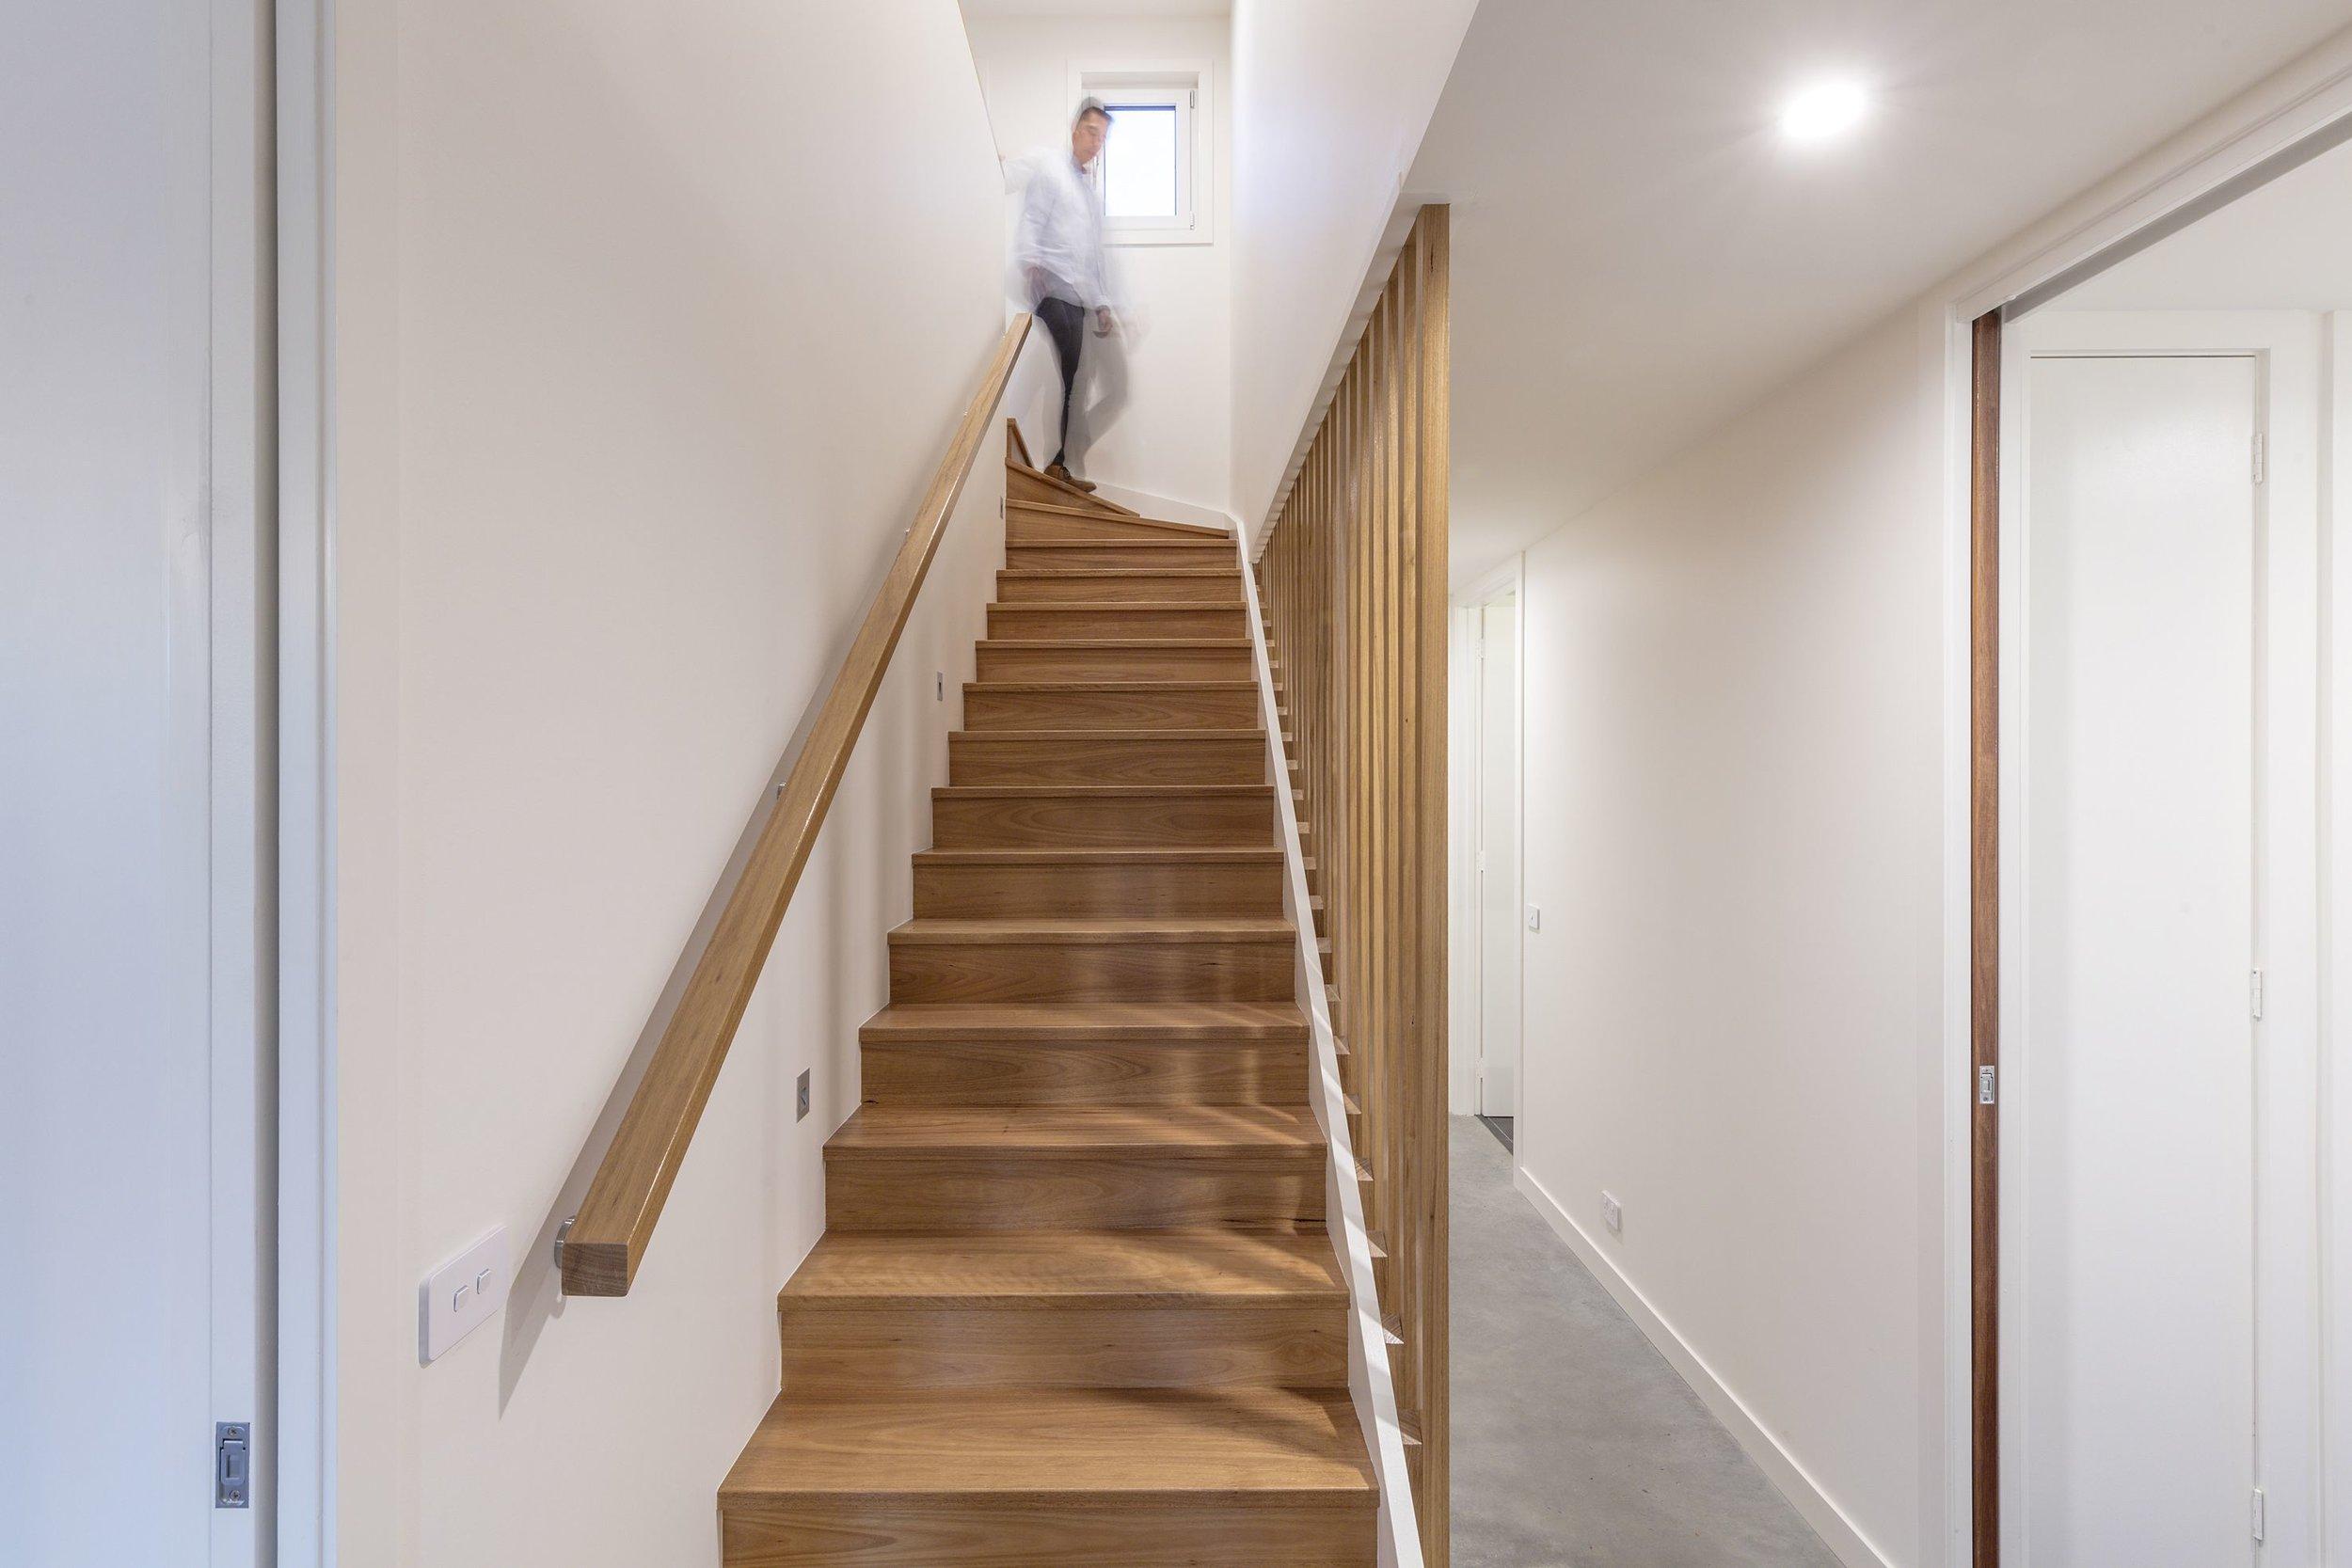 stair action.jpg